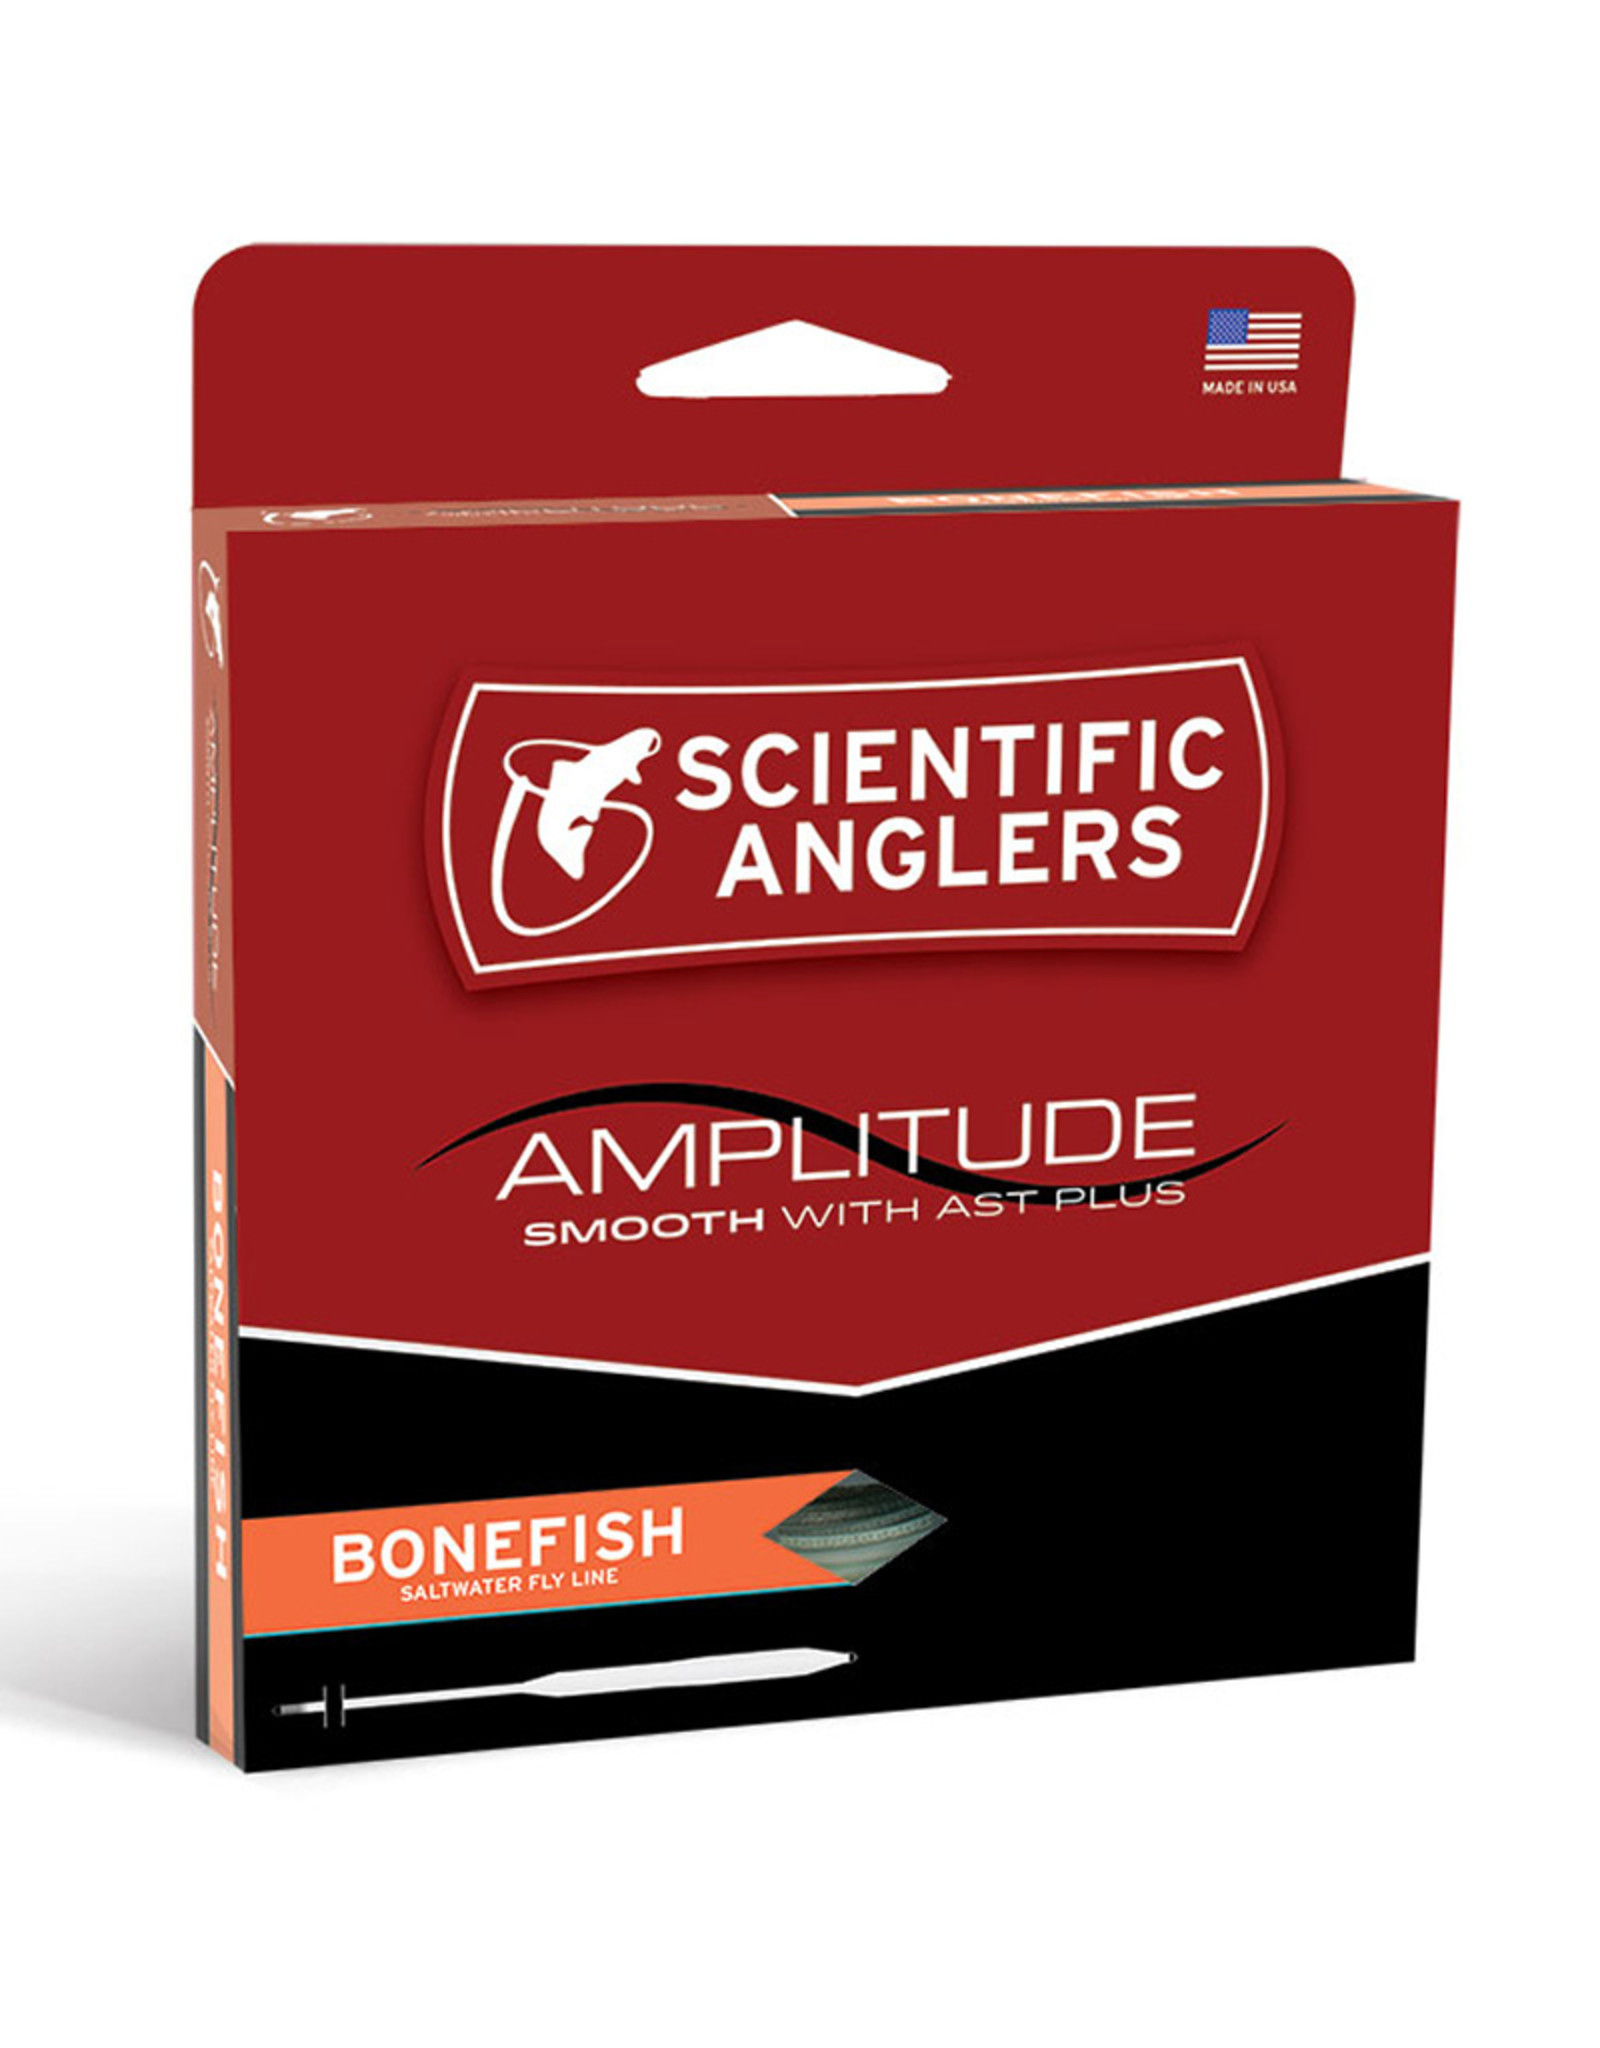 Scientific Anglers Amplitude Smooth: Bonefish